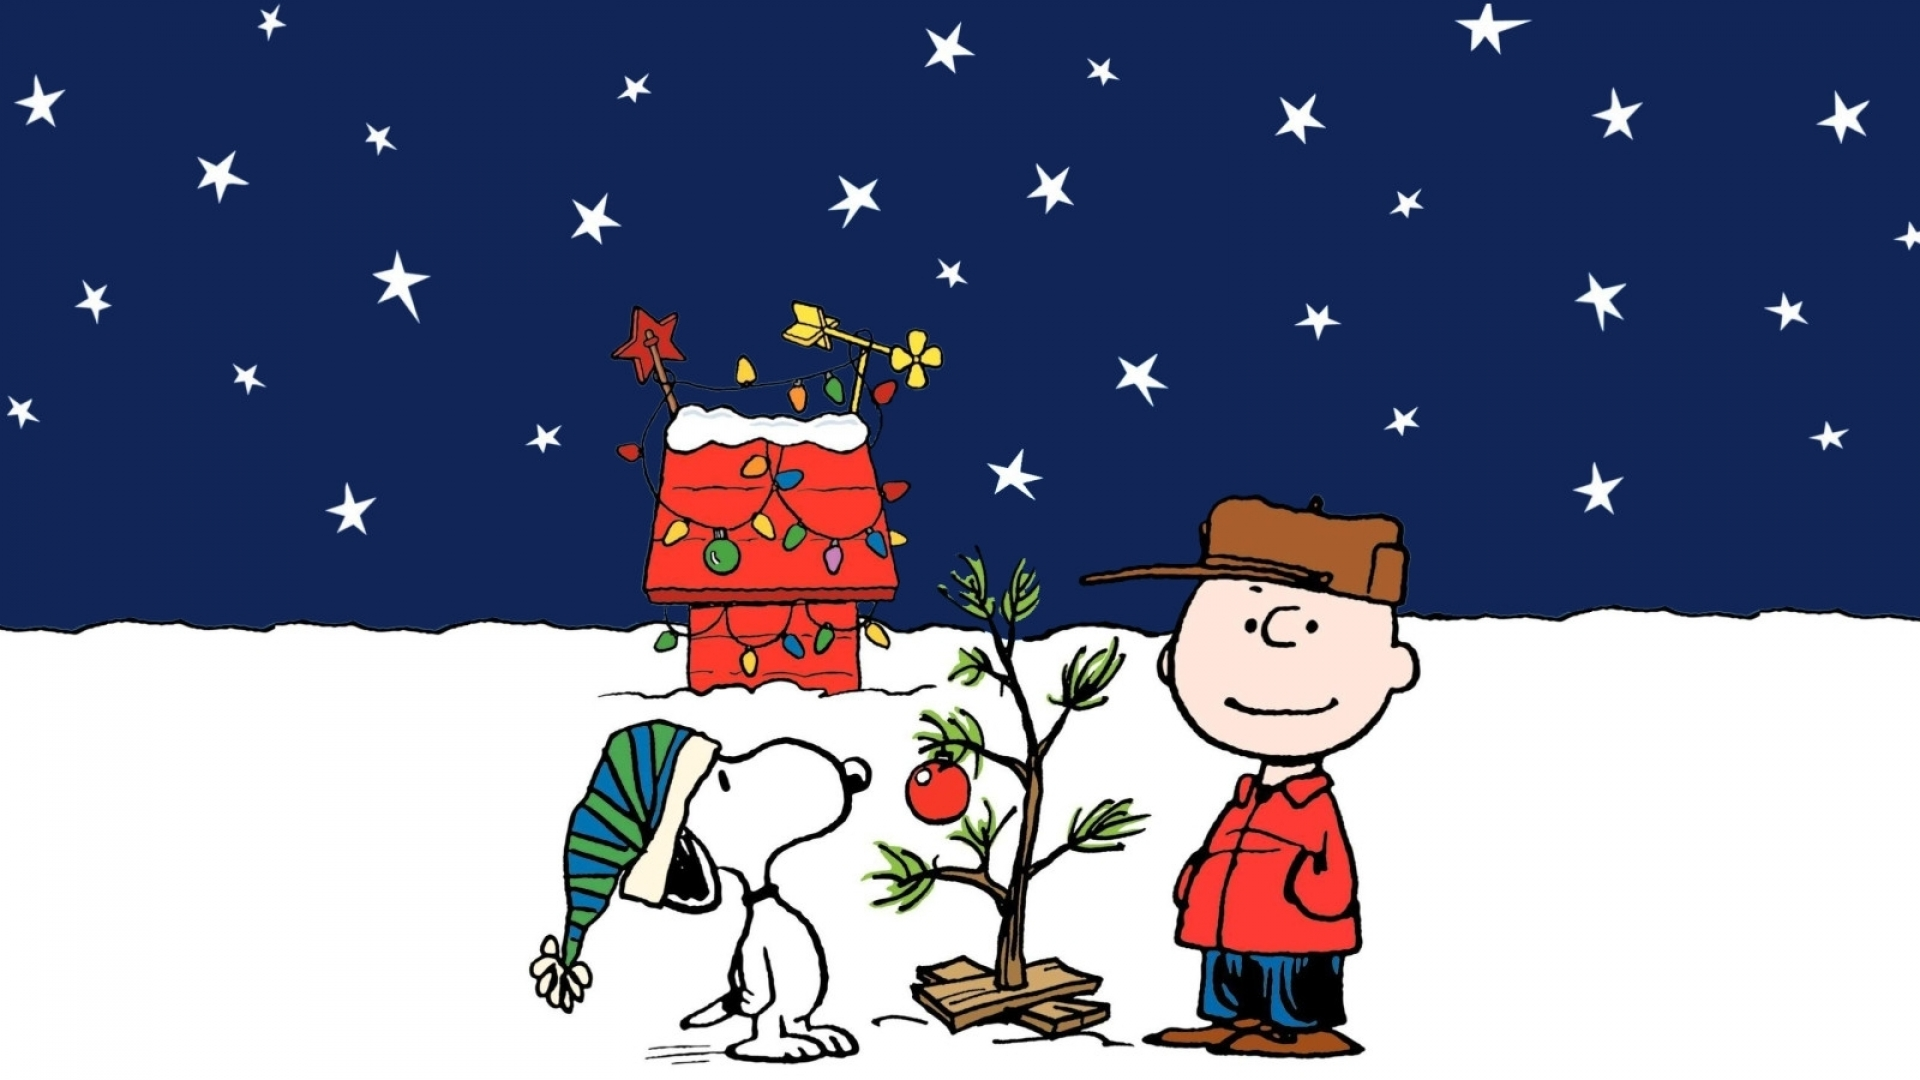 CHARLIE BROWN peanuts comics snoopy christmas gg wallpaper 1920x1080 1920x1080